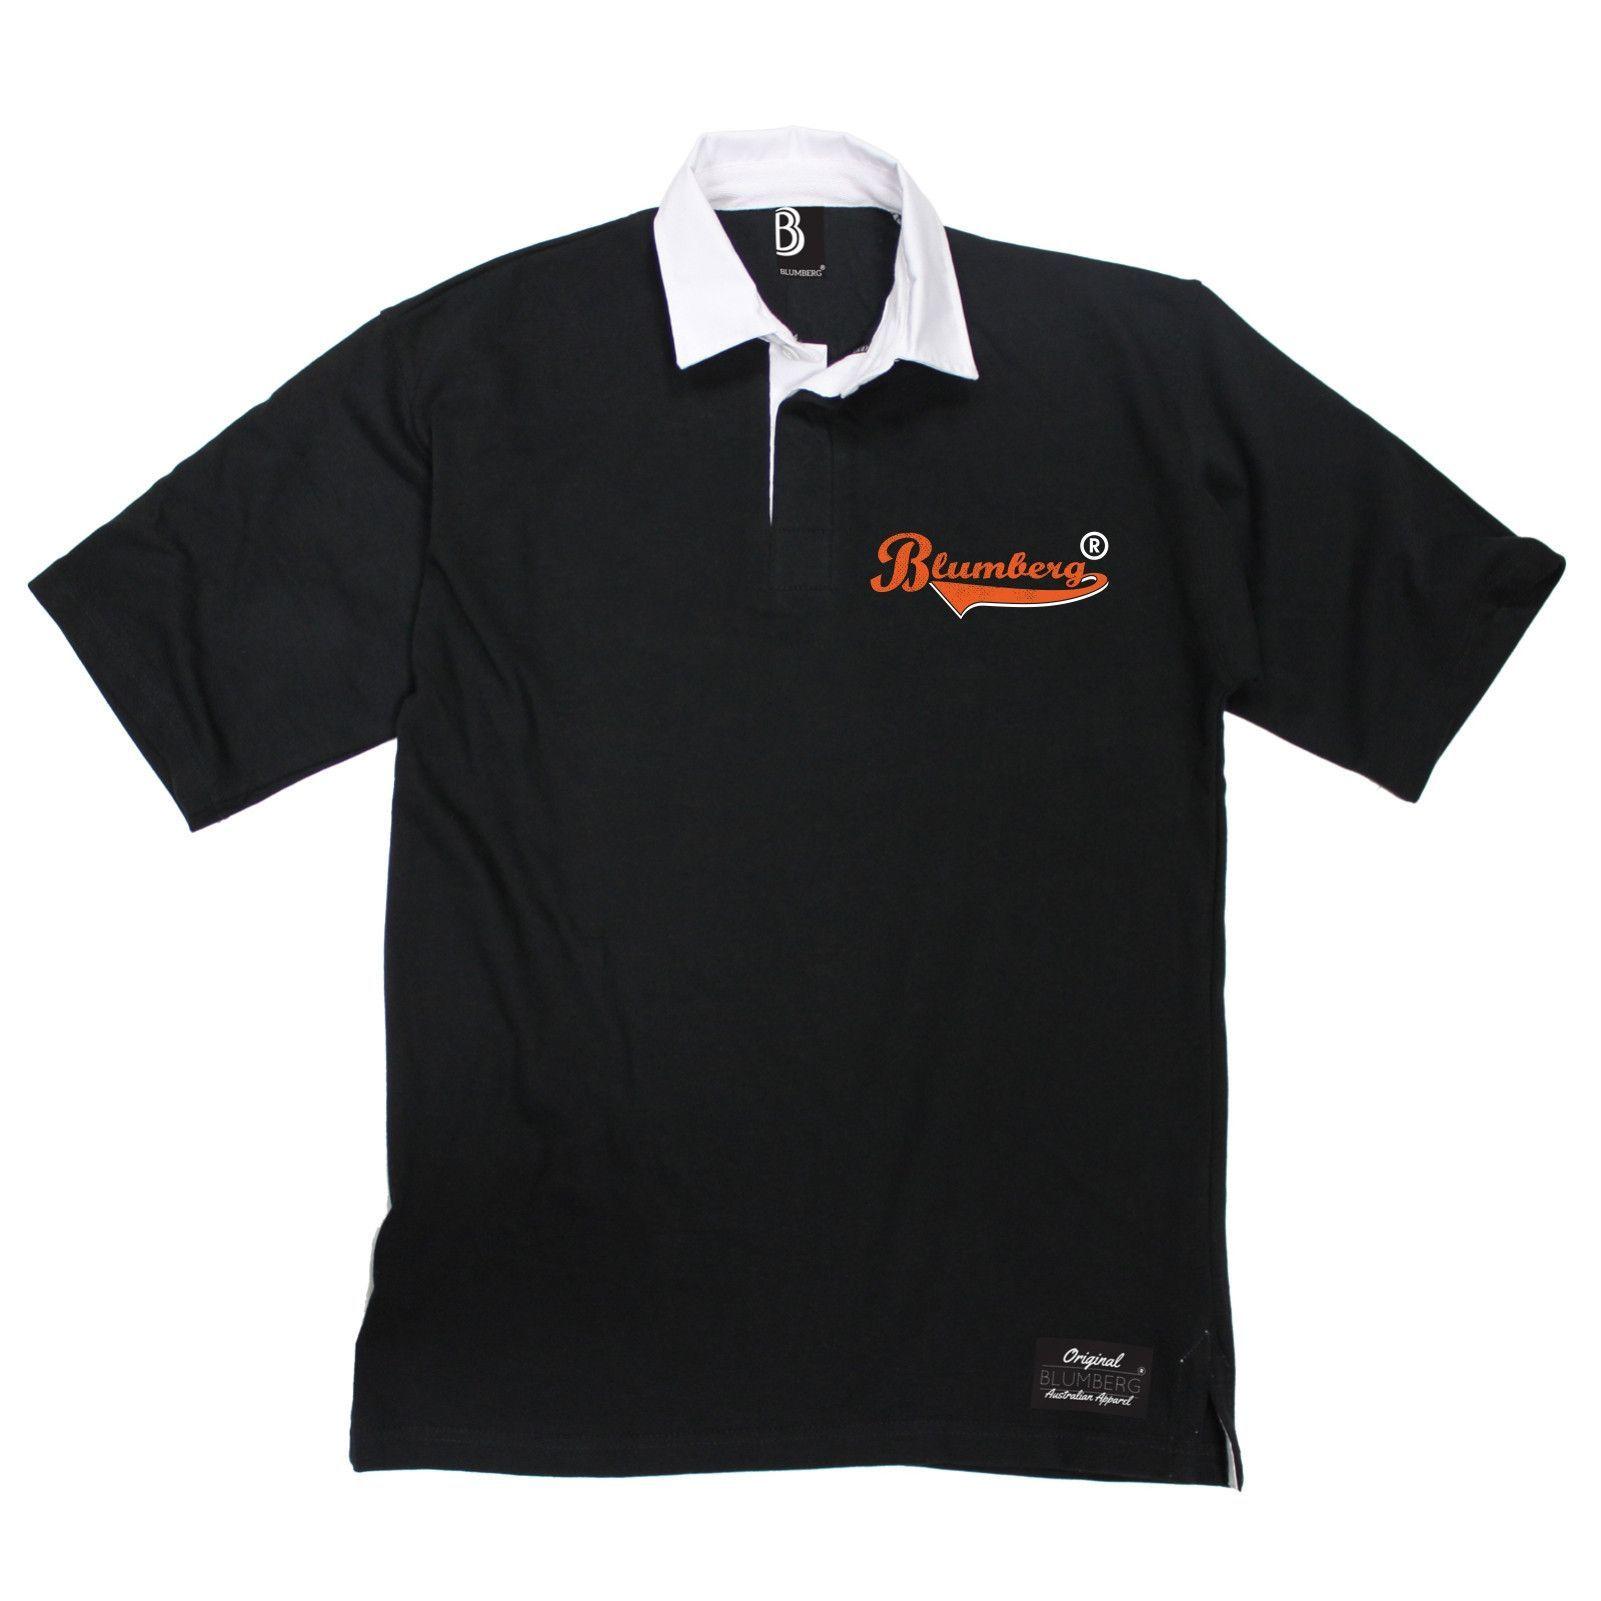 Design t shirt rugby - Blumberg Australia Men S Orange Text Breast Pocket Design Premium Rugby Shirt